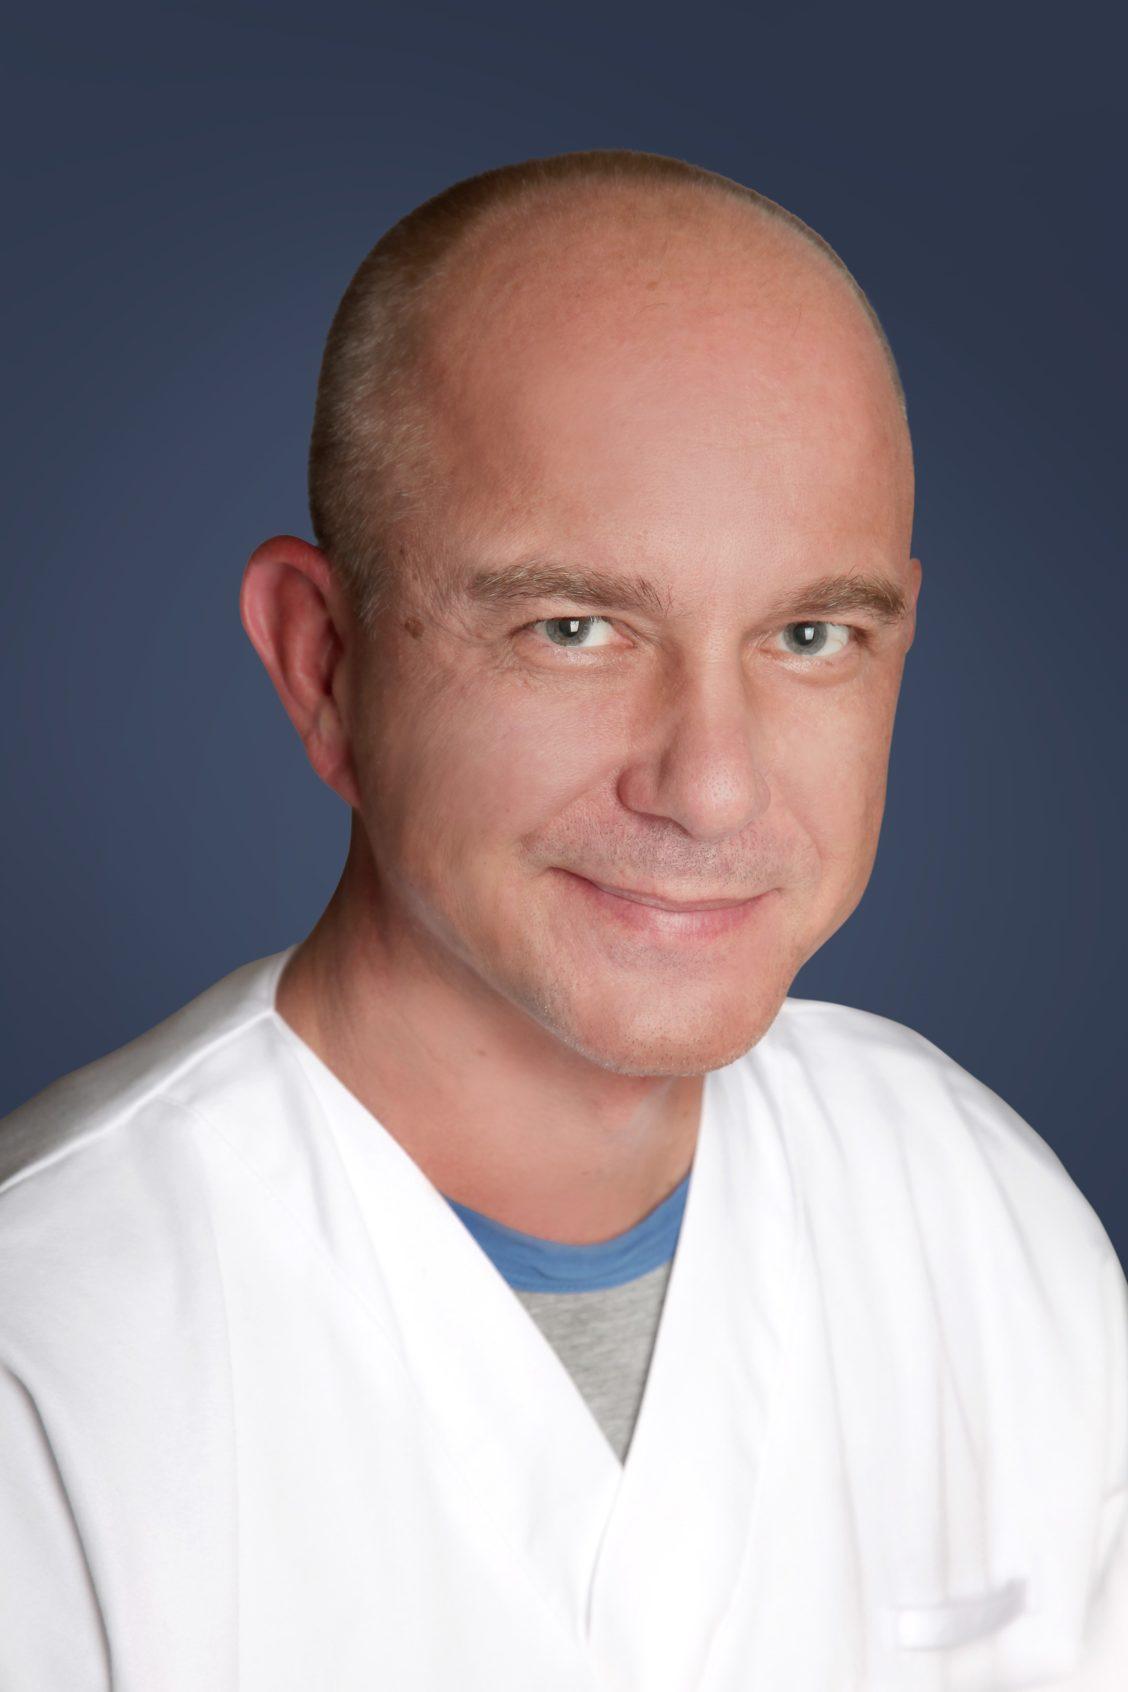 Dr. Jens Schneider, FEBVS